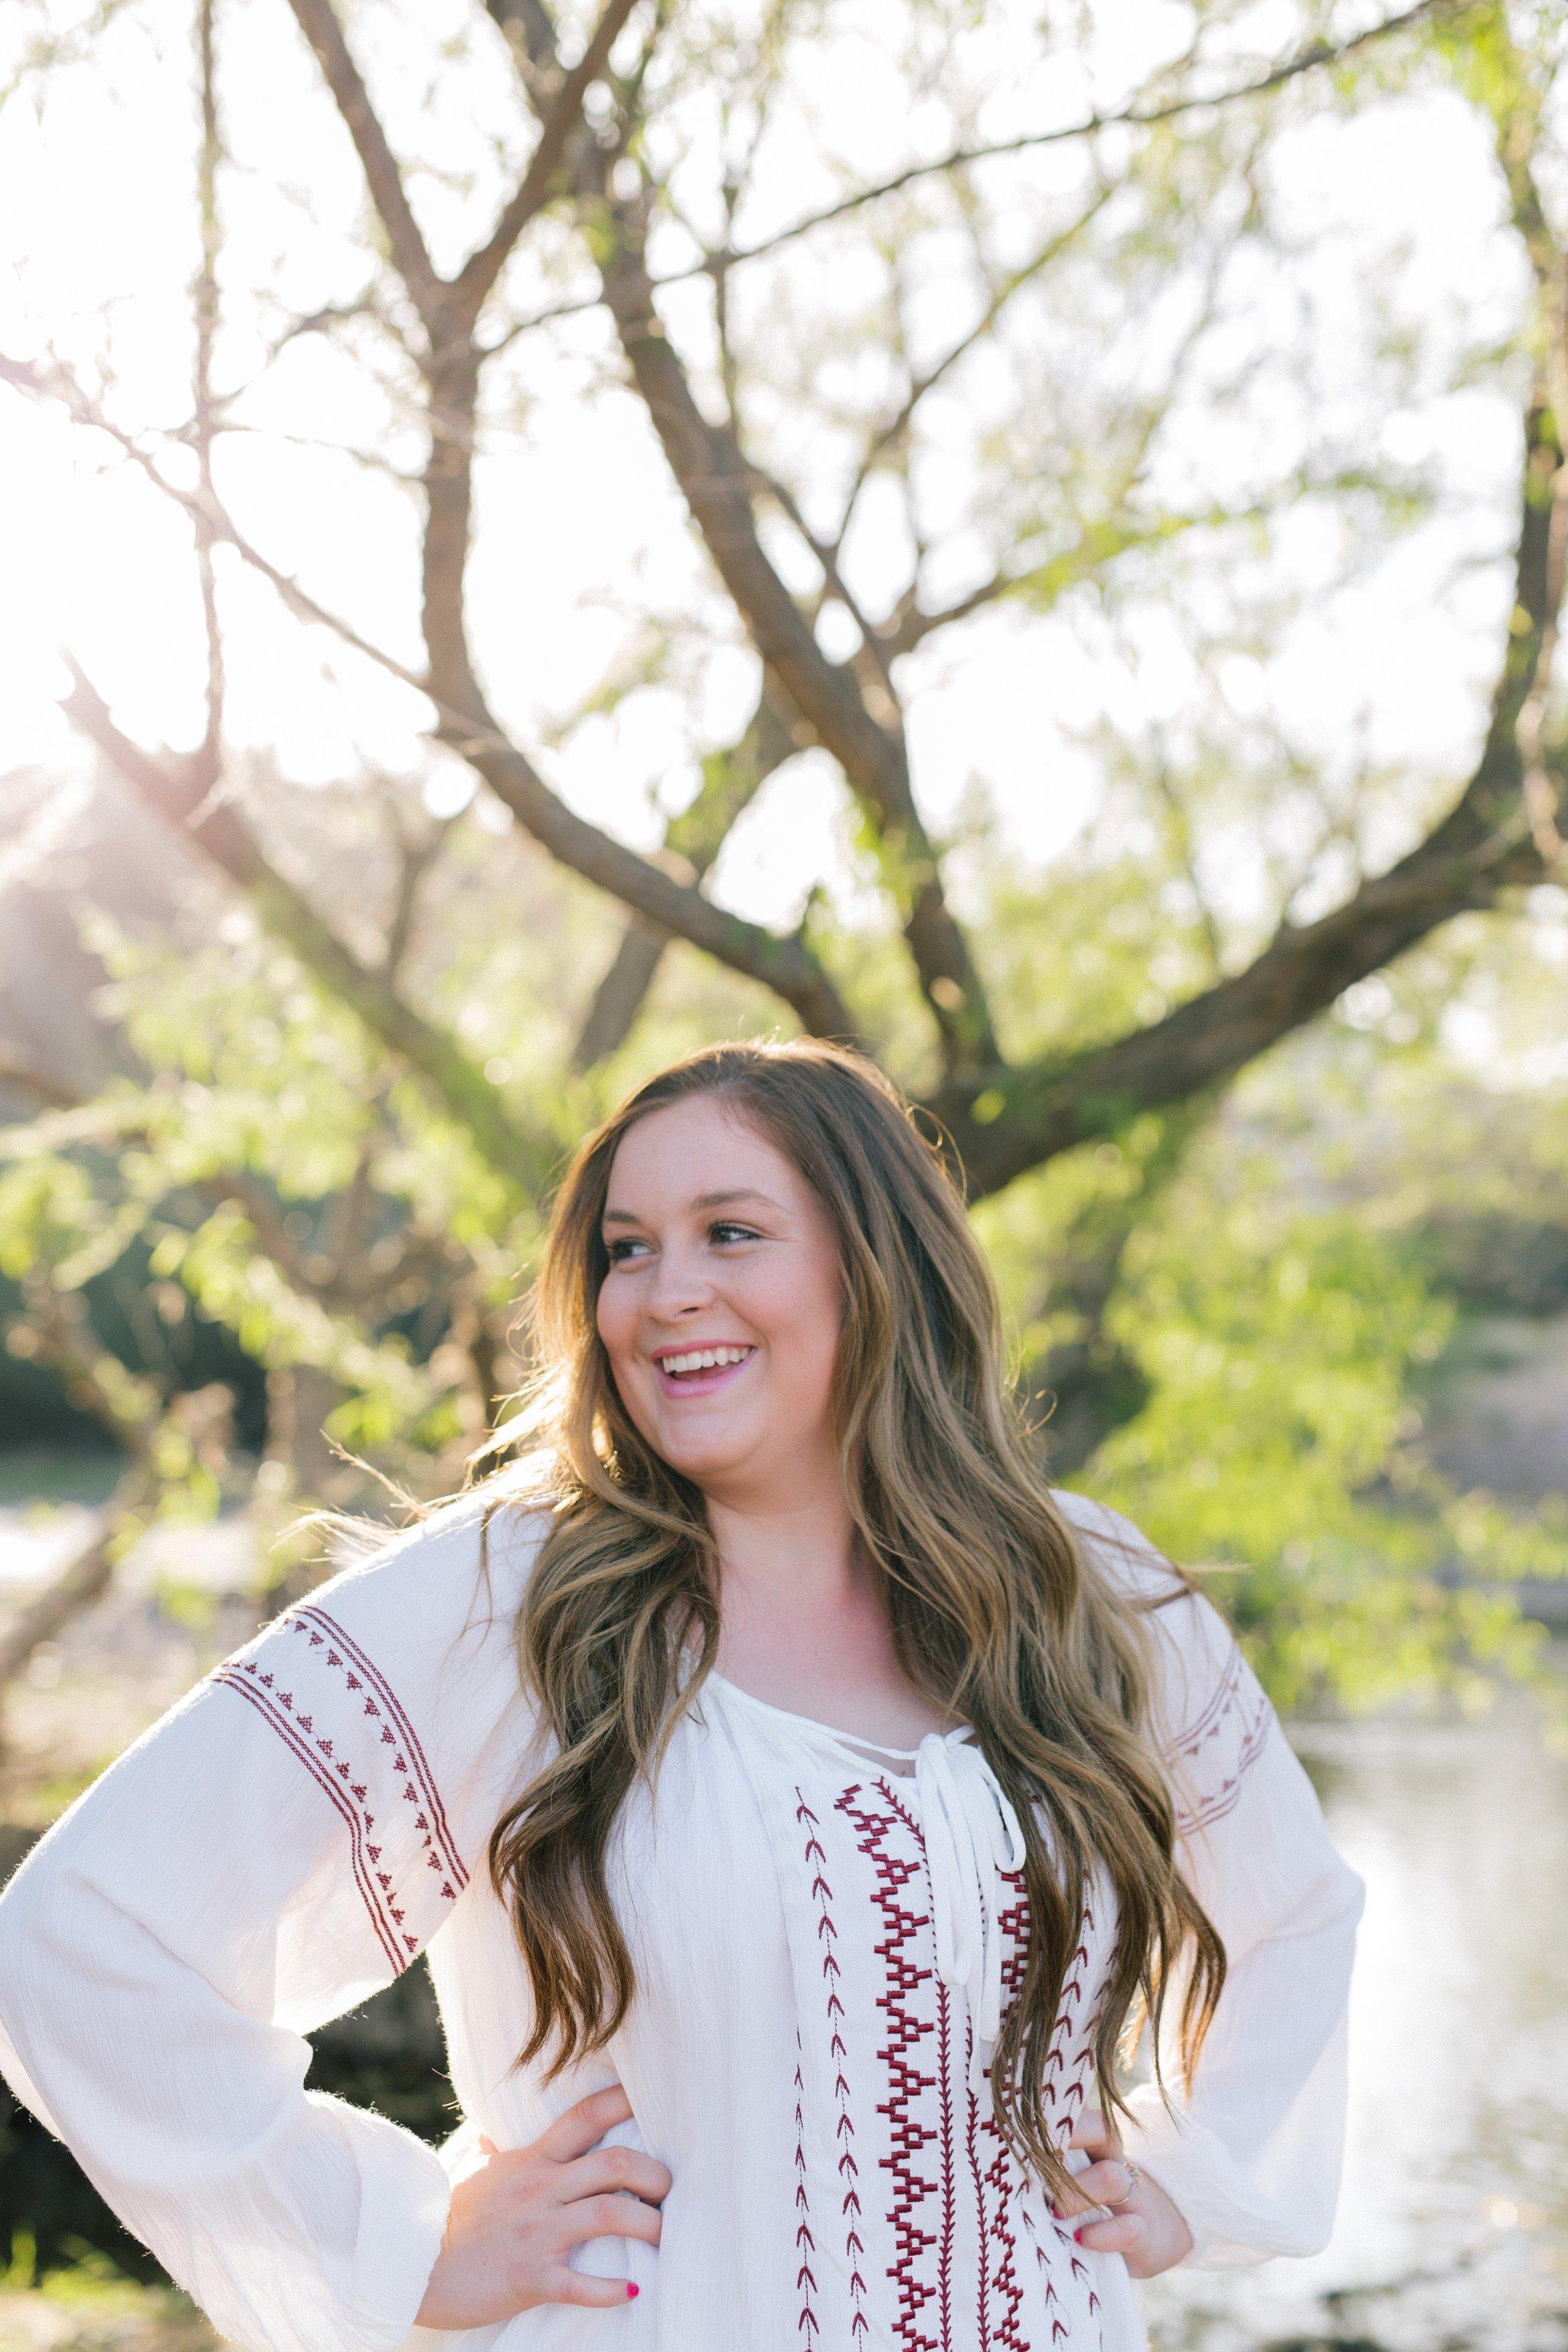 natural authentic fun outdoor candid high school senior portraits in Arizona